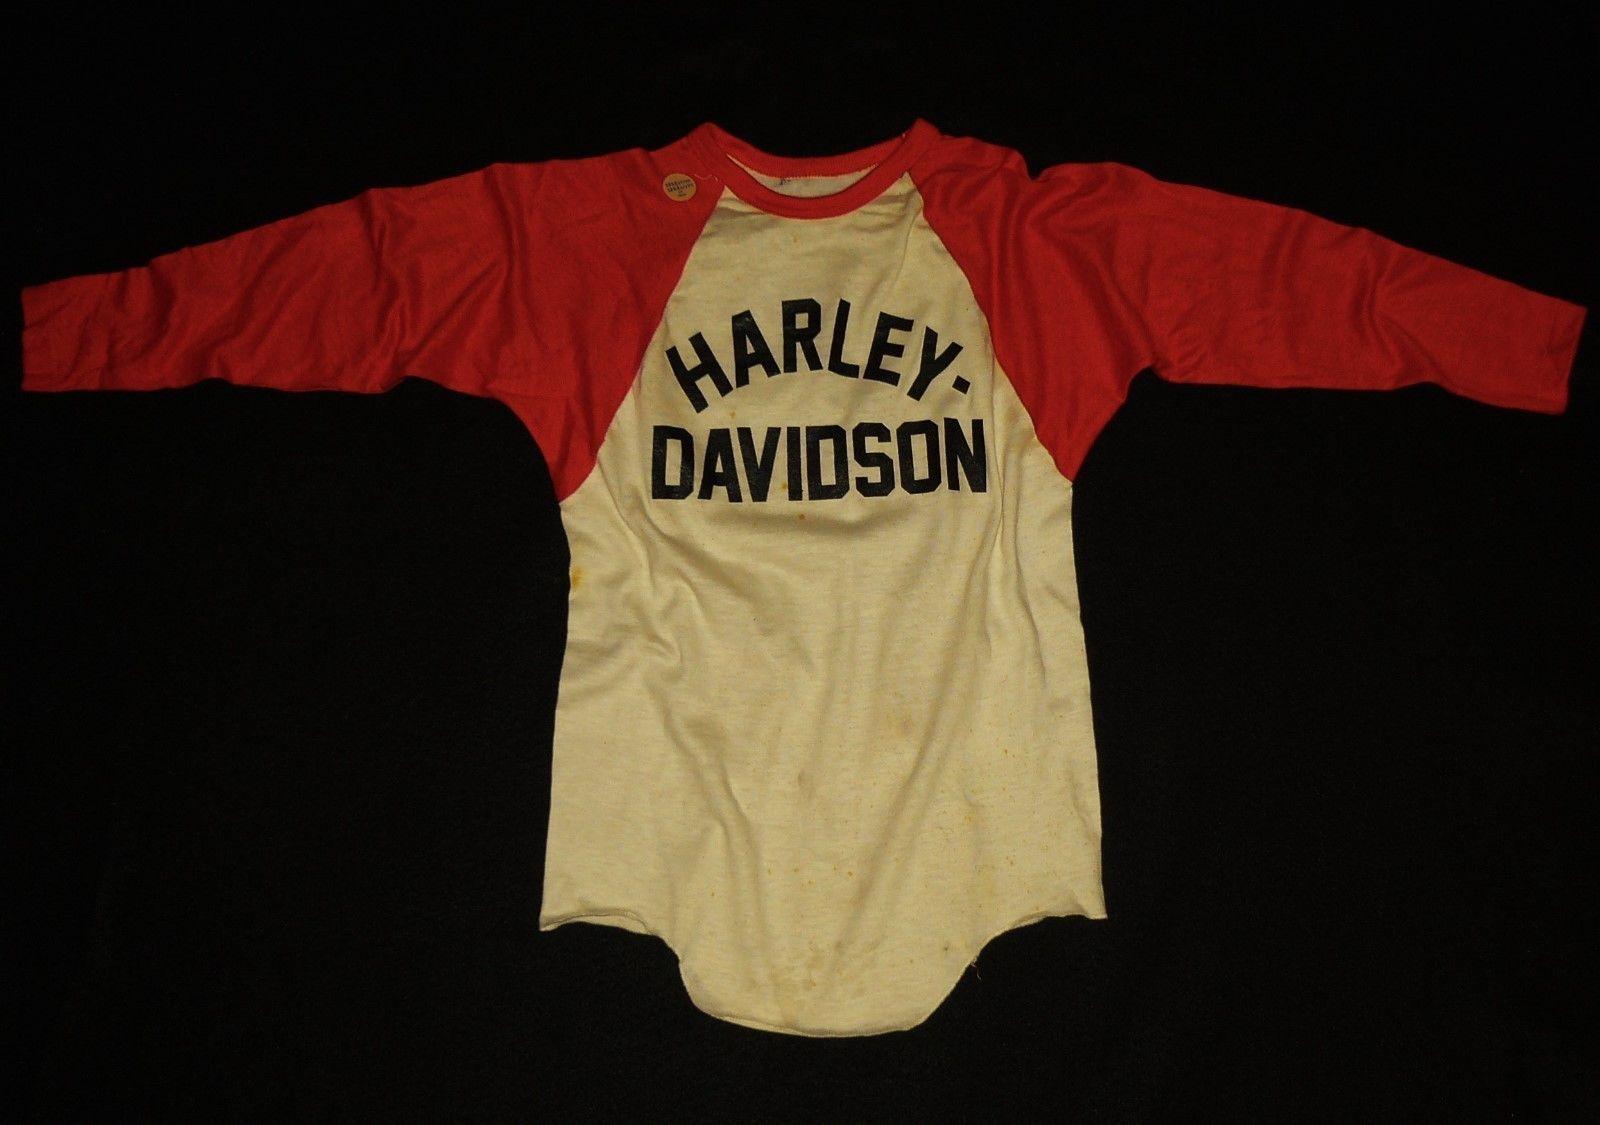 Harley Davidson T Shirts Ebay Uk | ANLIS